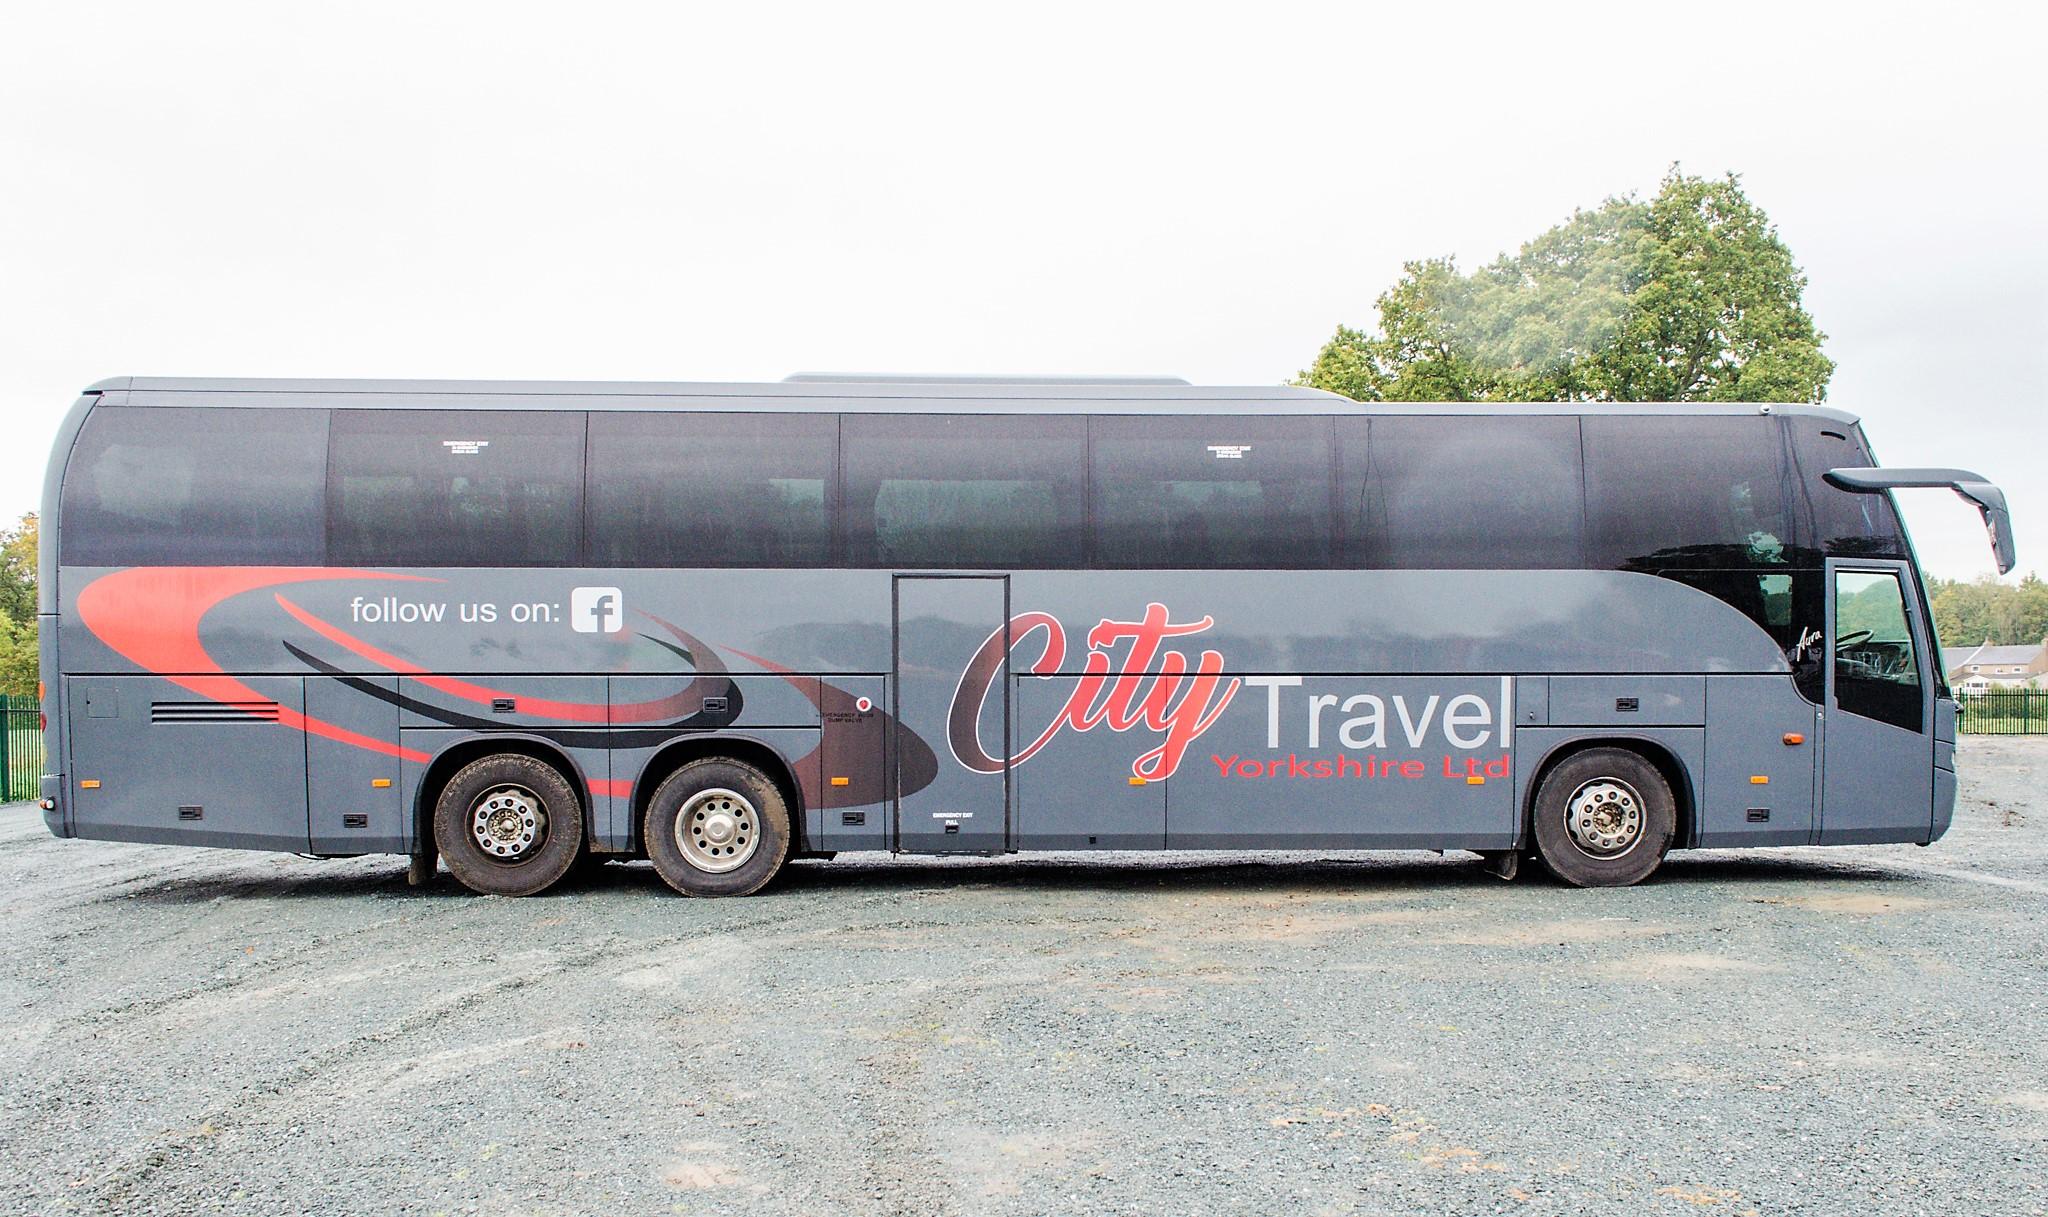 MAN F2000 Beulas Aura 54 seat luxury coach Registration Number: KC08 KTC Date of Registration: 30/ - Image 8 of 19